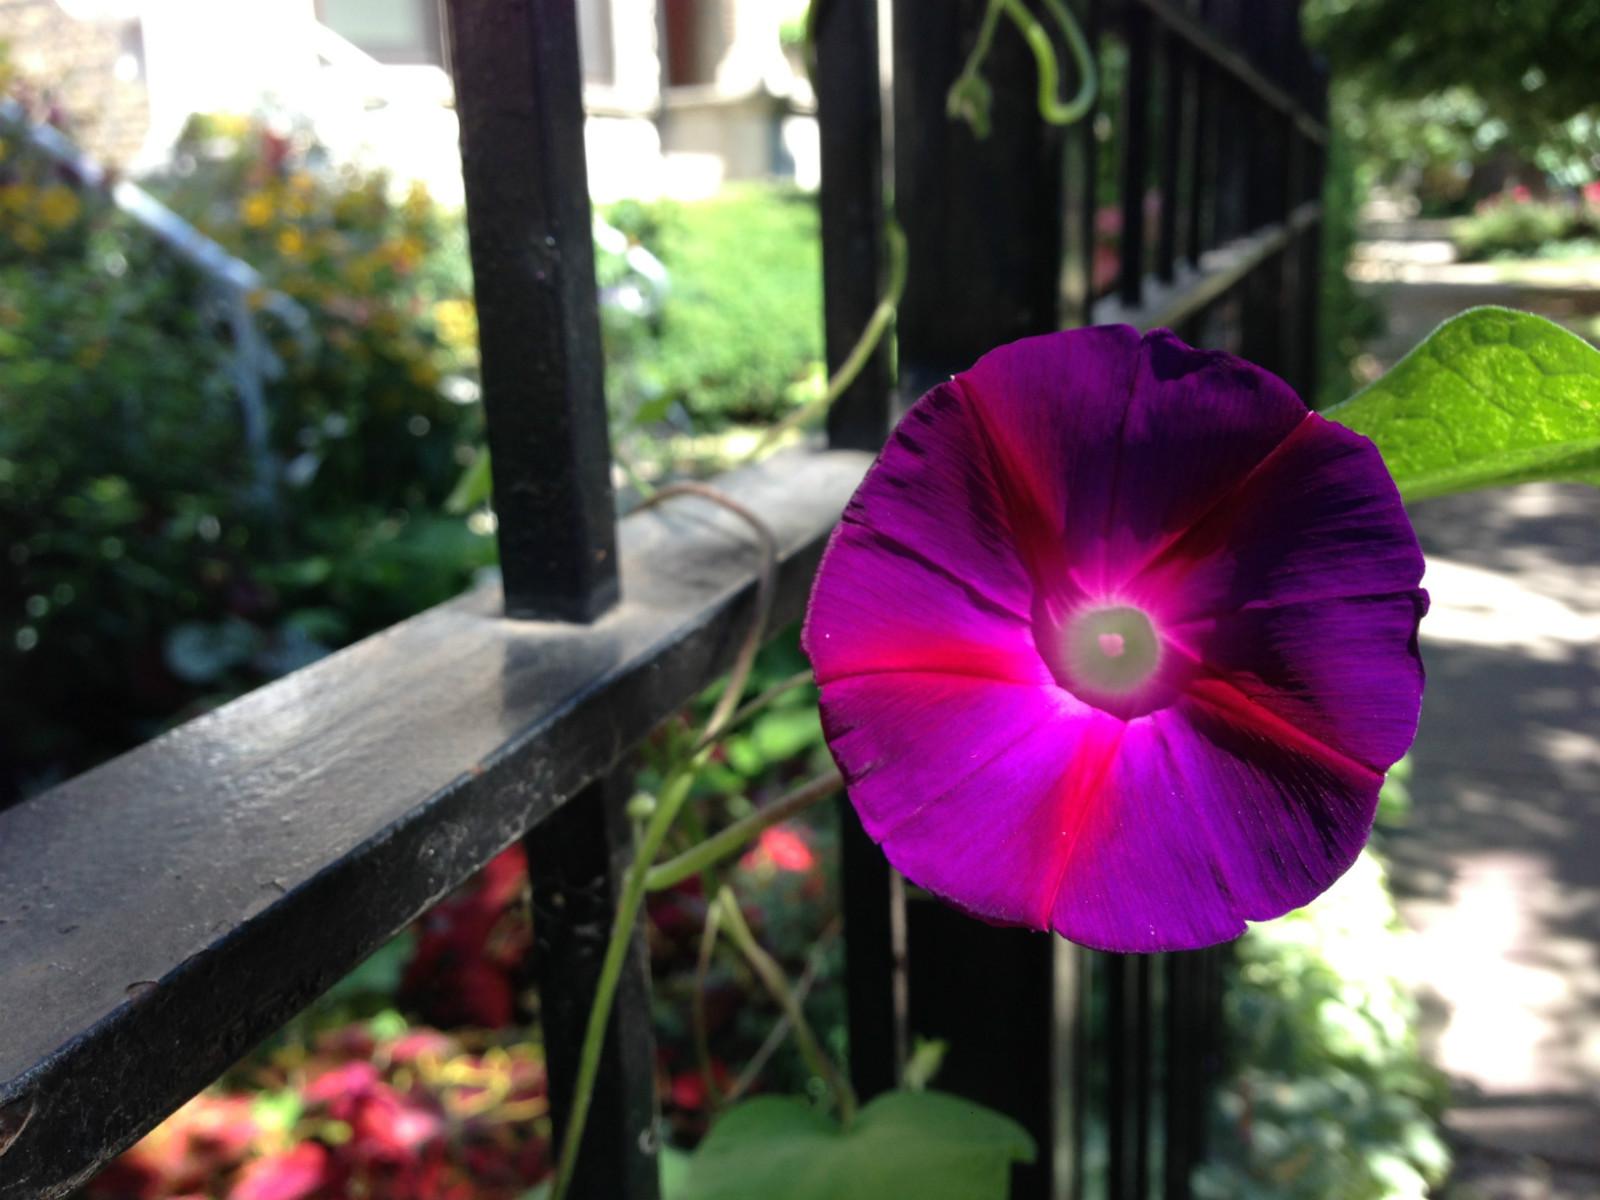 Friendly neighborhood flower.